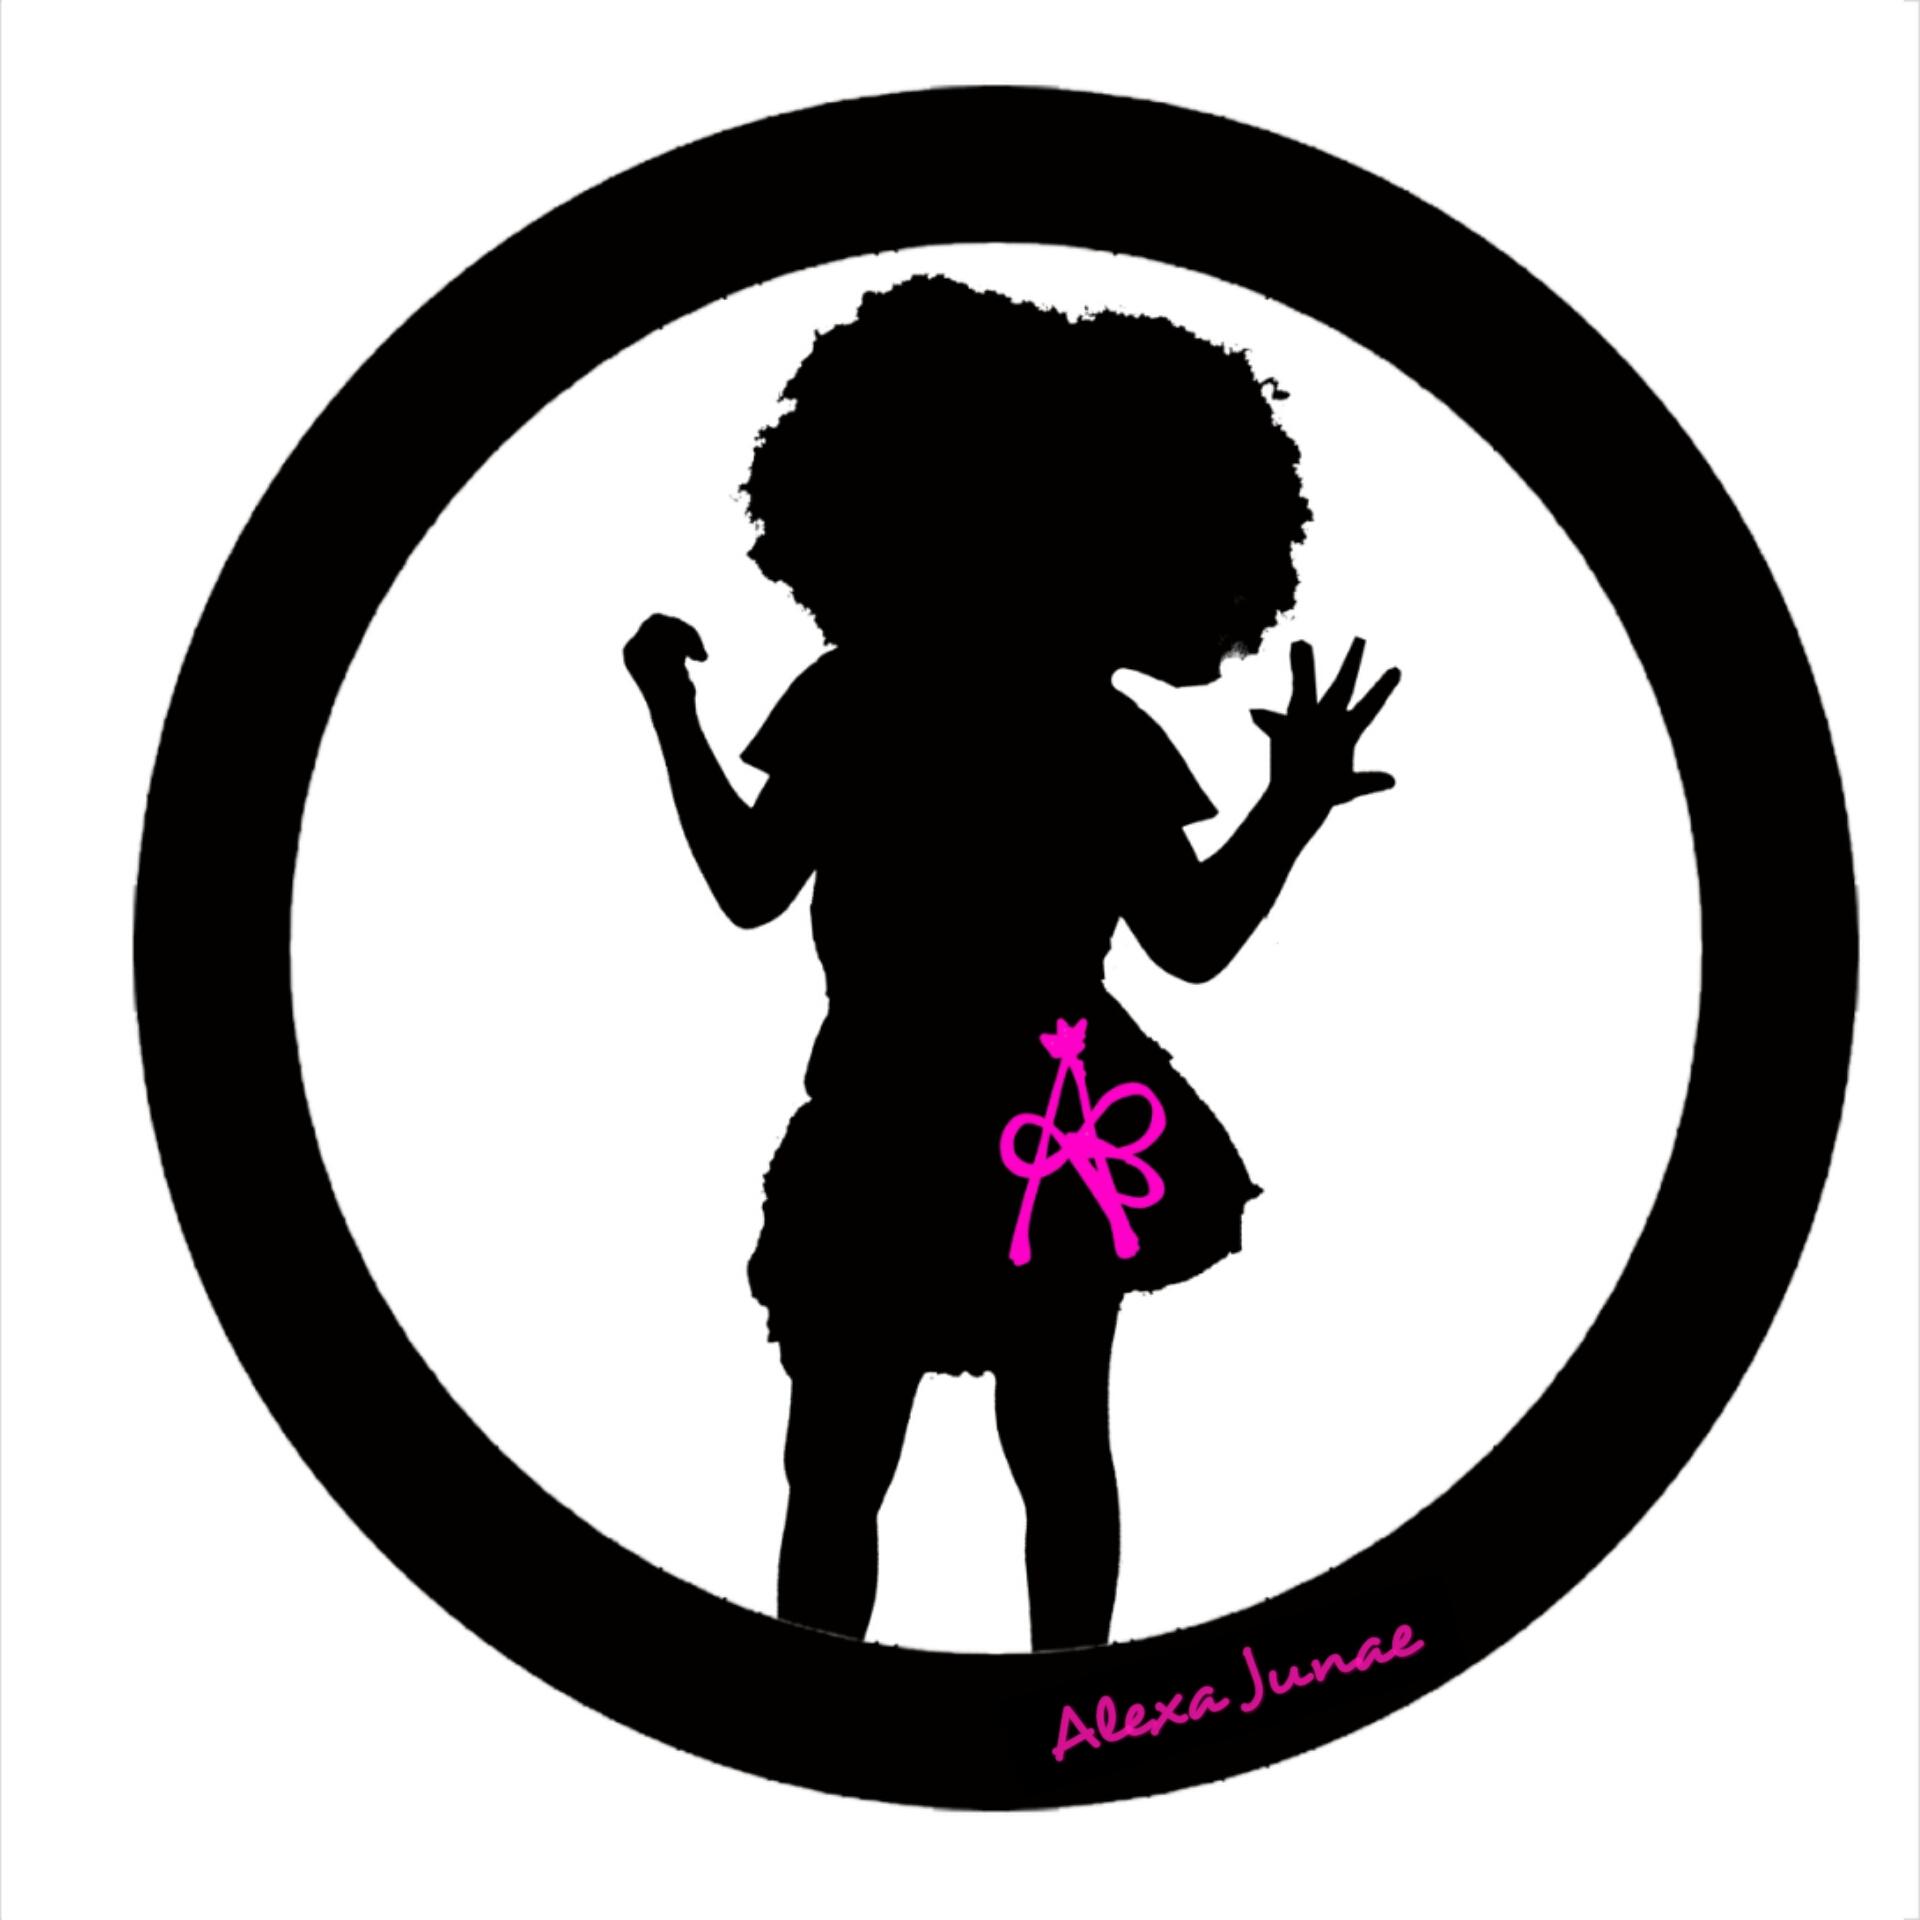 Alexa Junae - logo